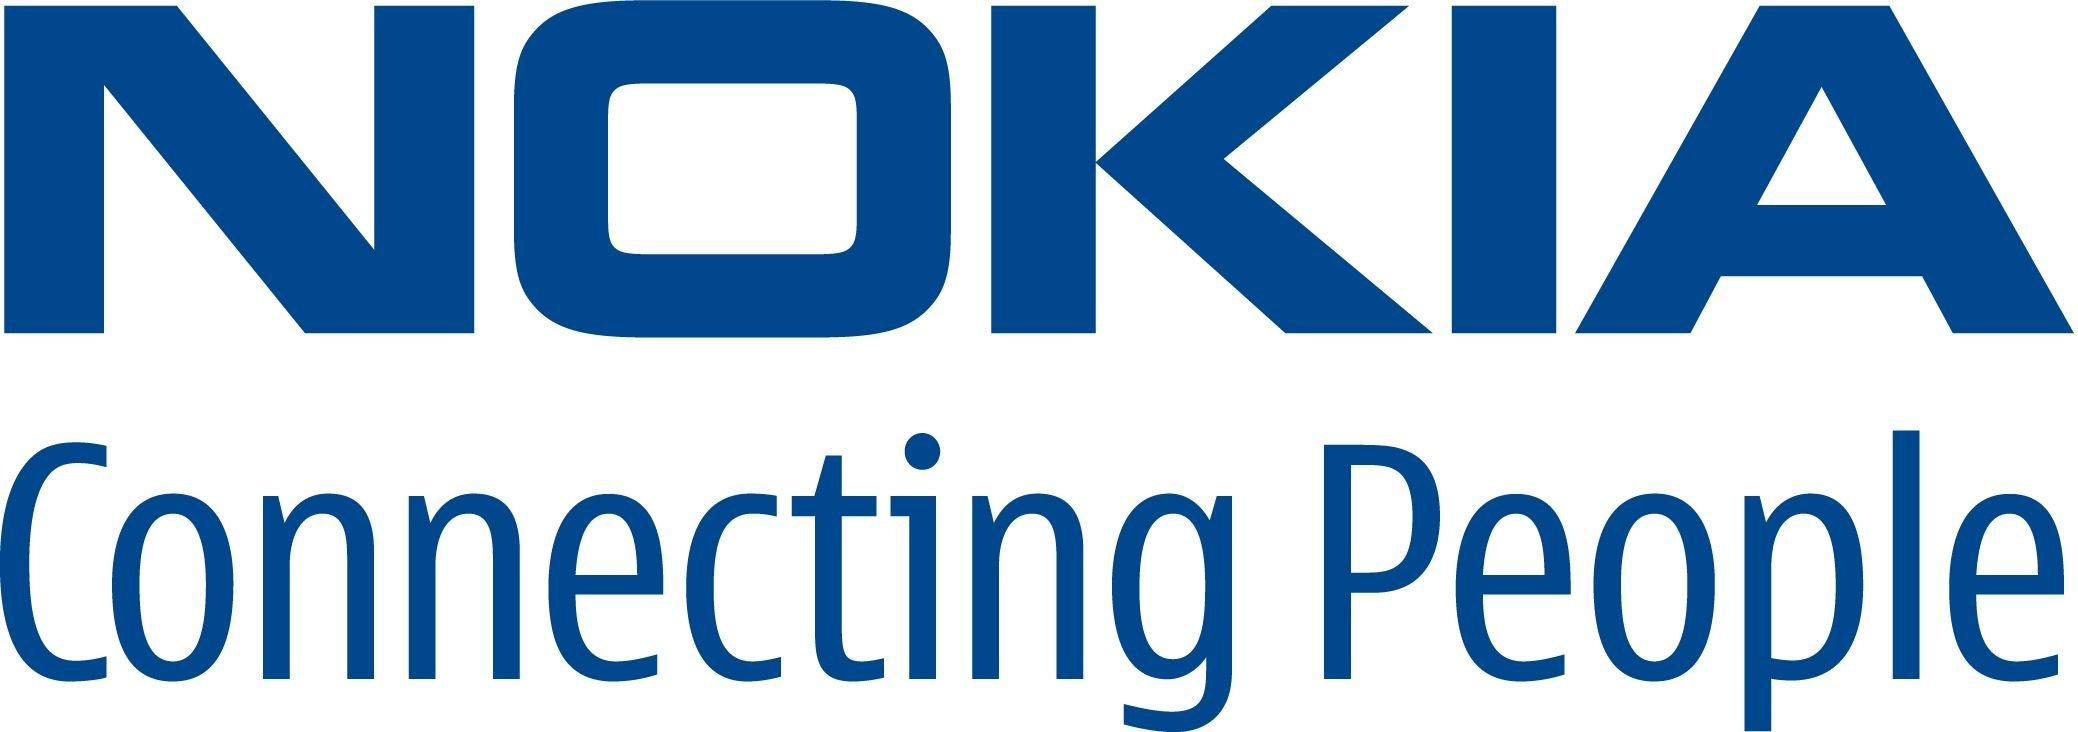 Nokia Corporation logo